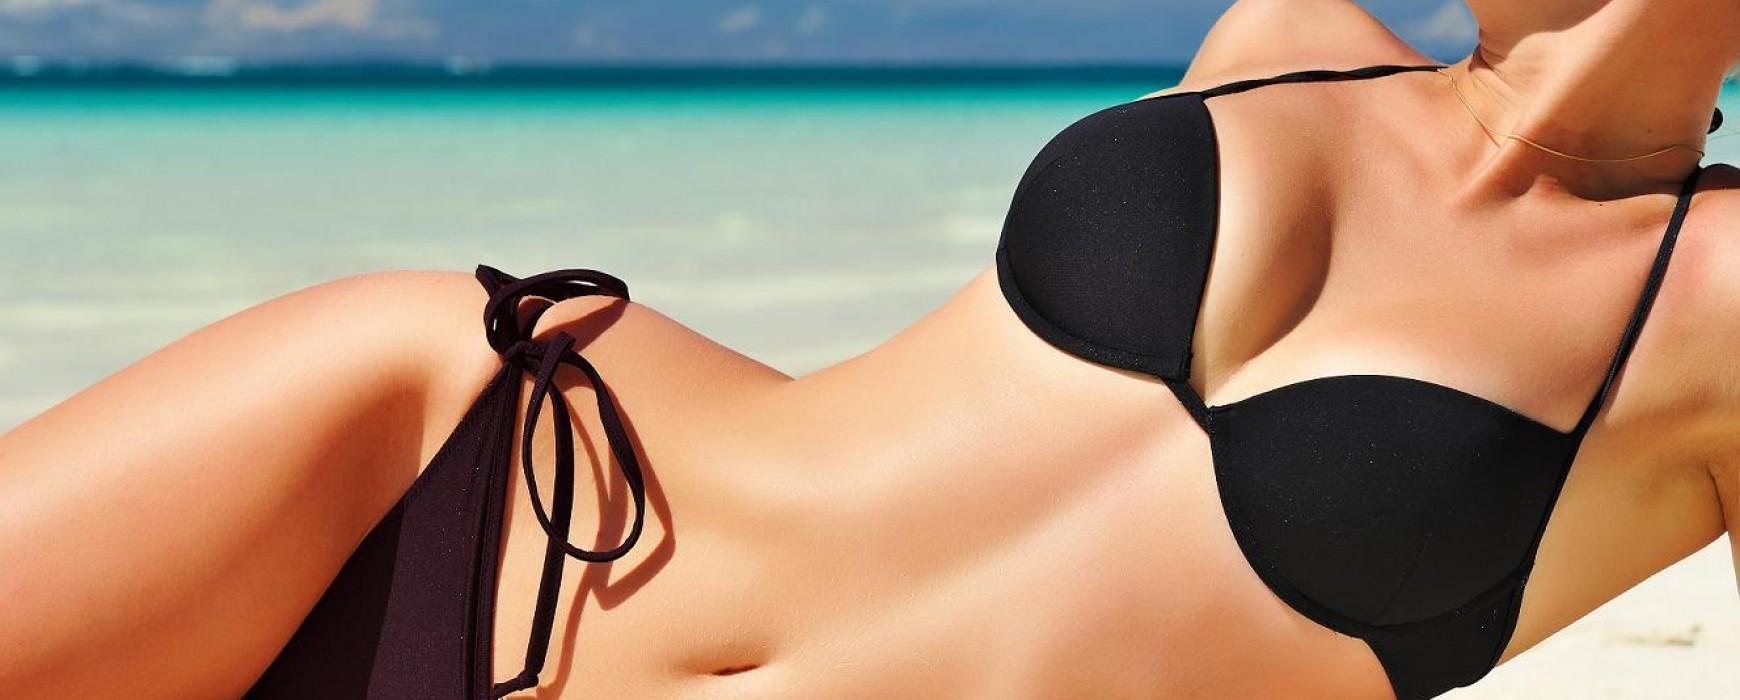 Mitos do corpo perfeito